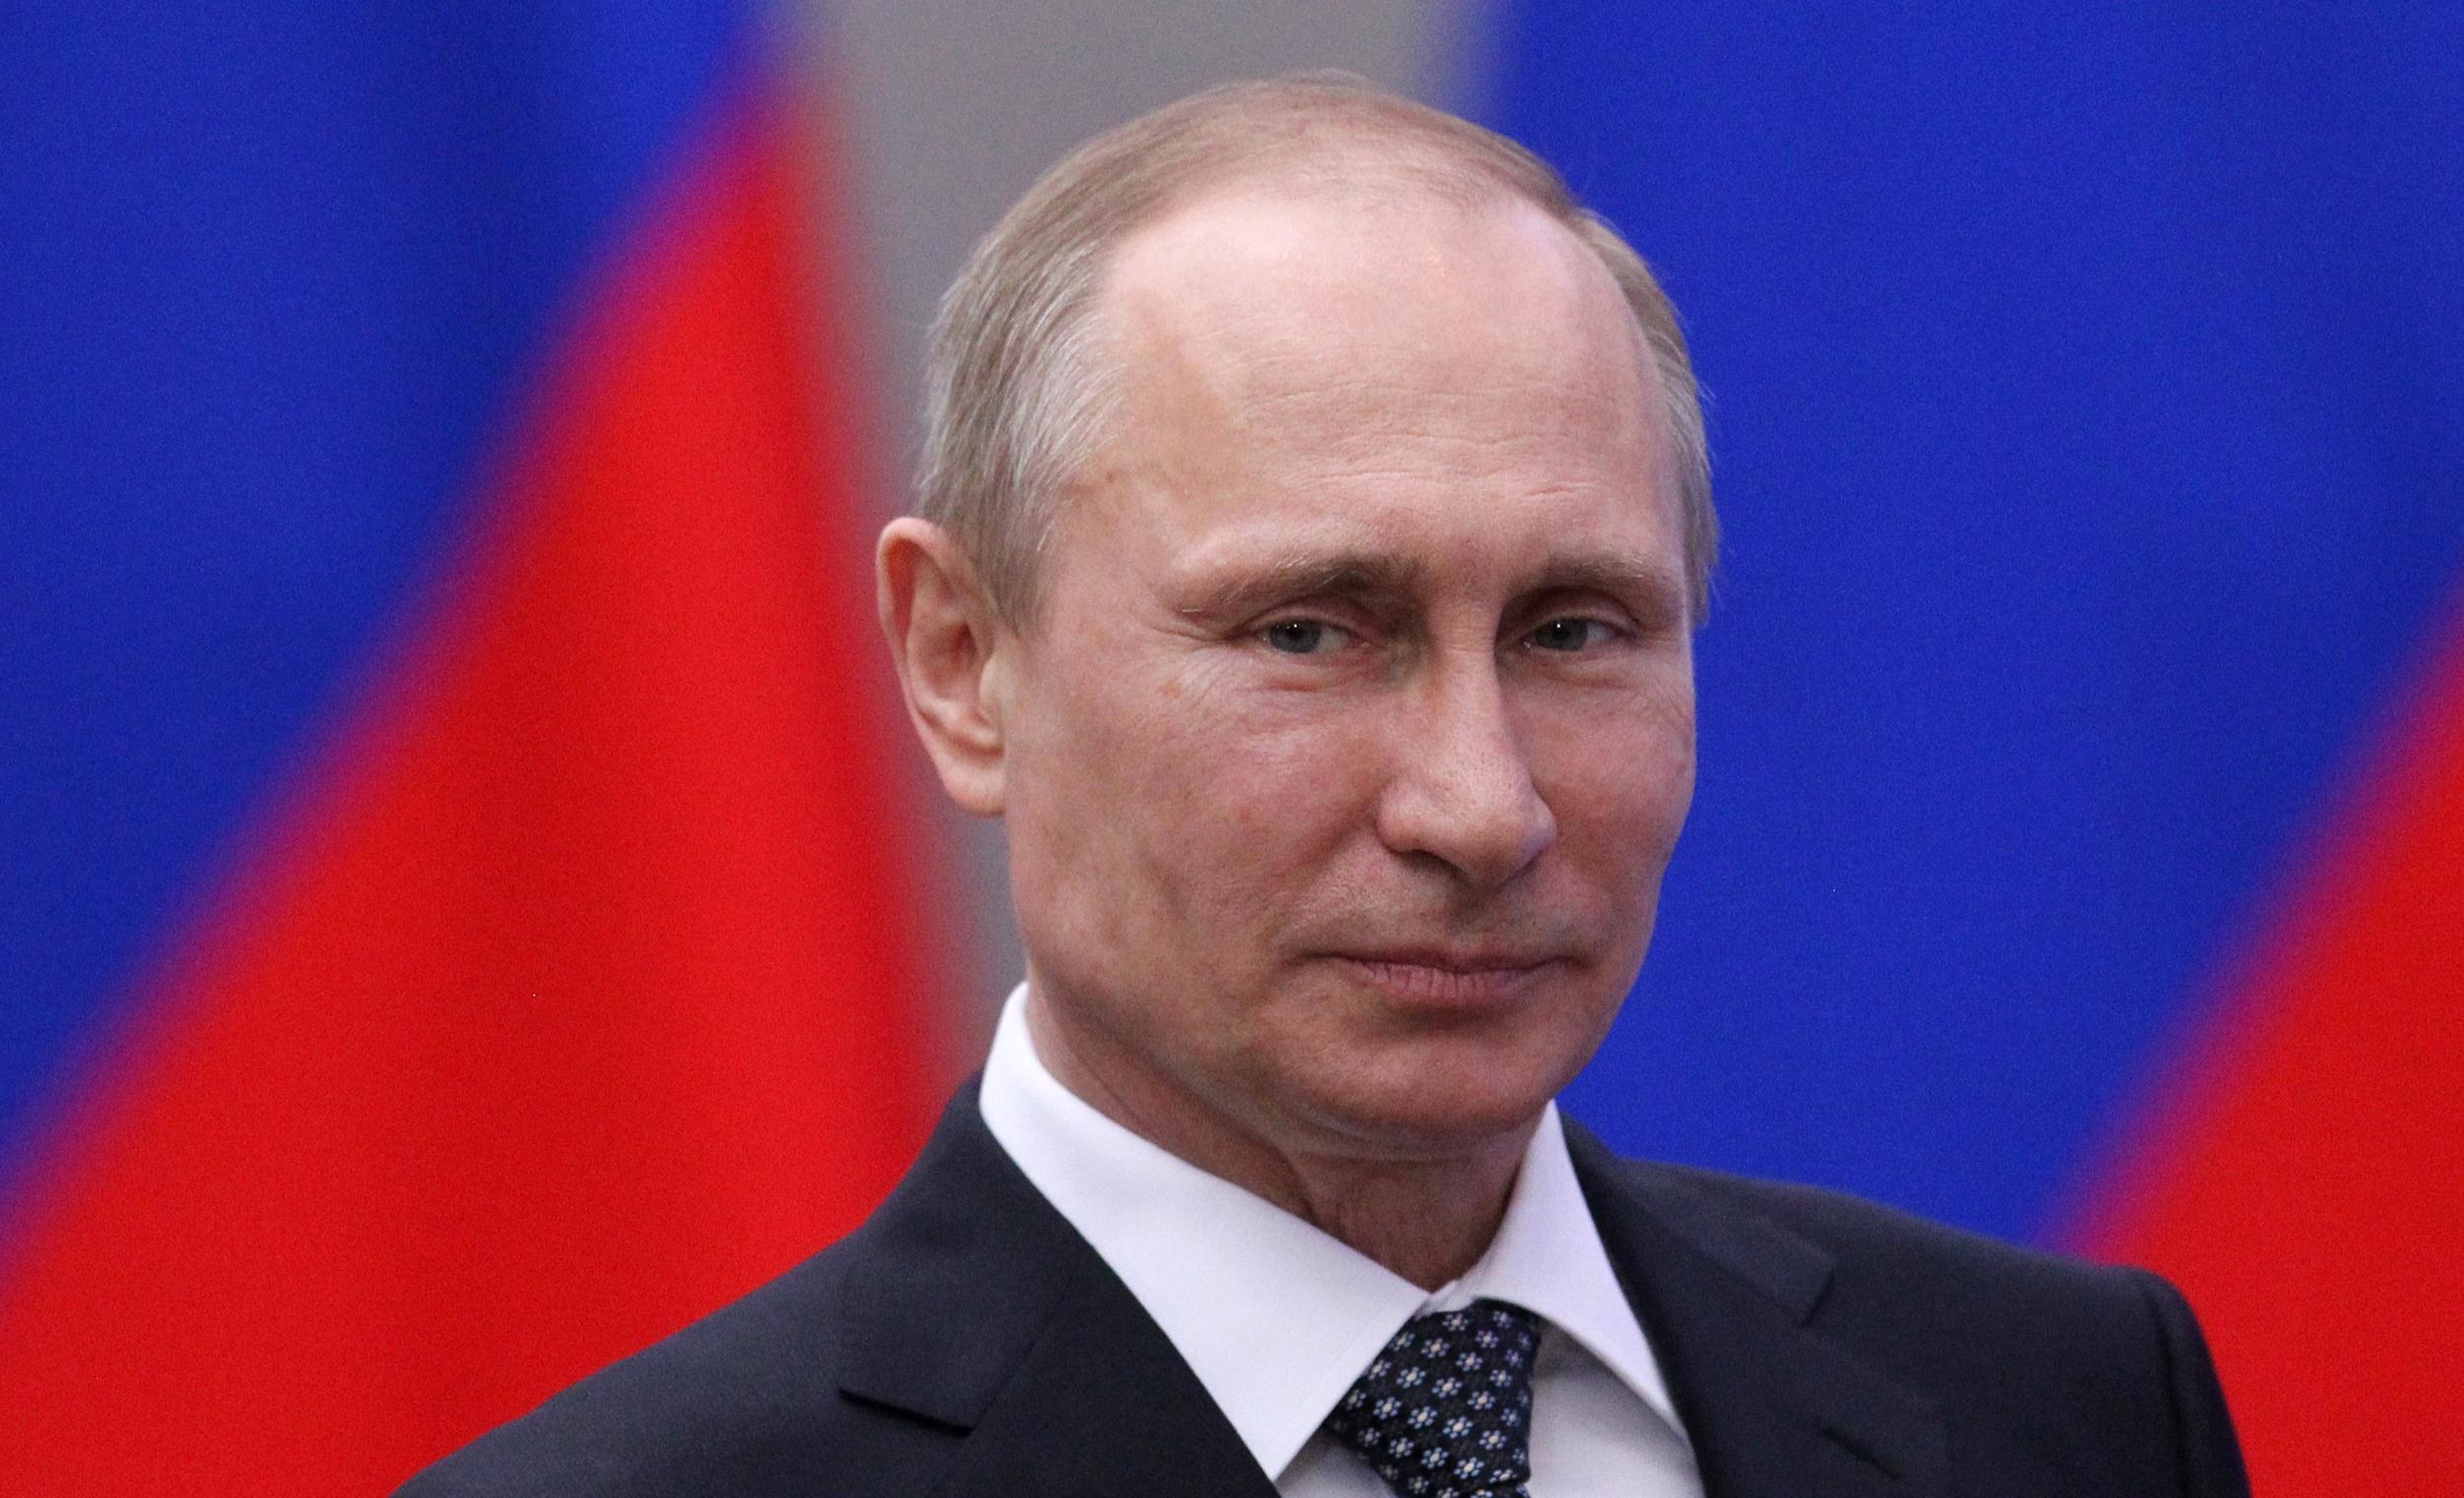 Putin will hold a speech at military parade in Belgrade